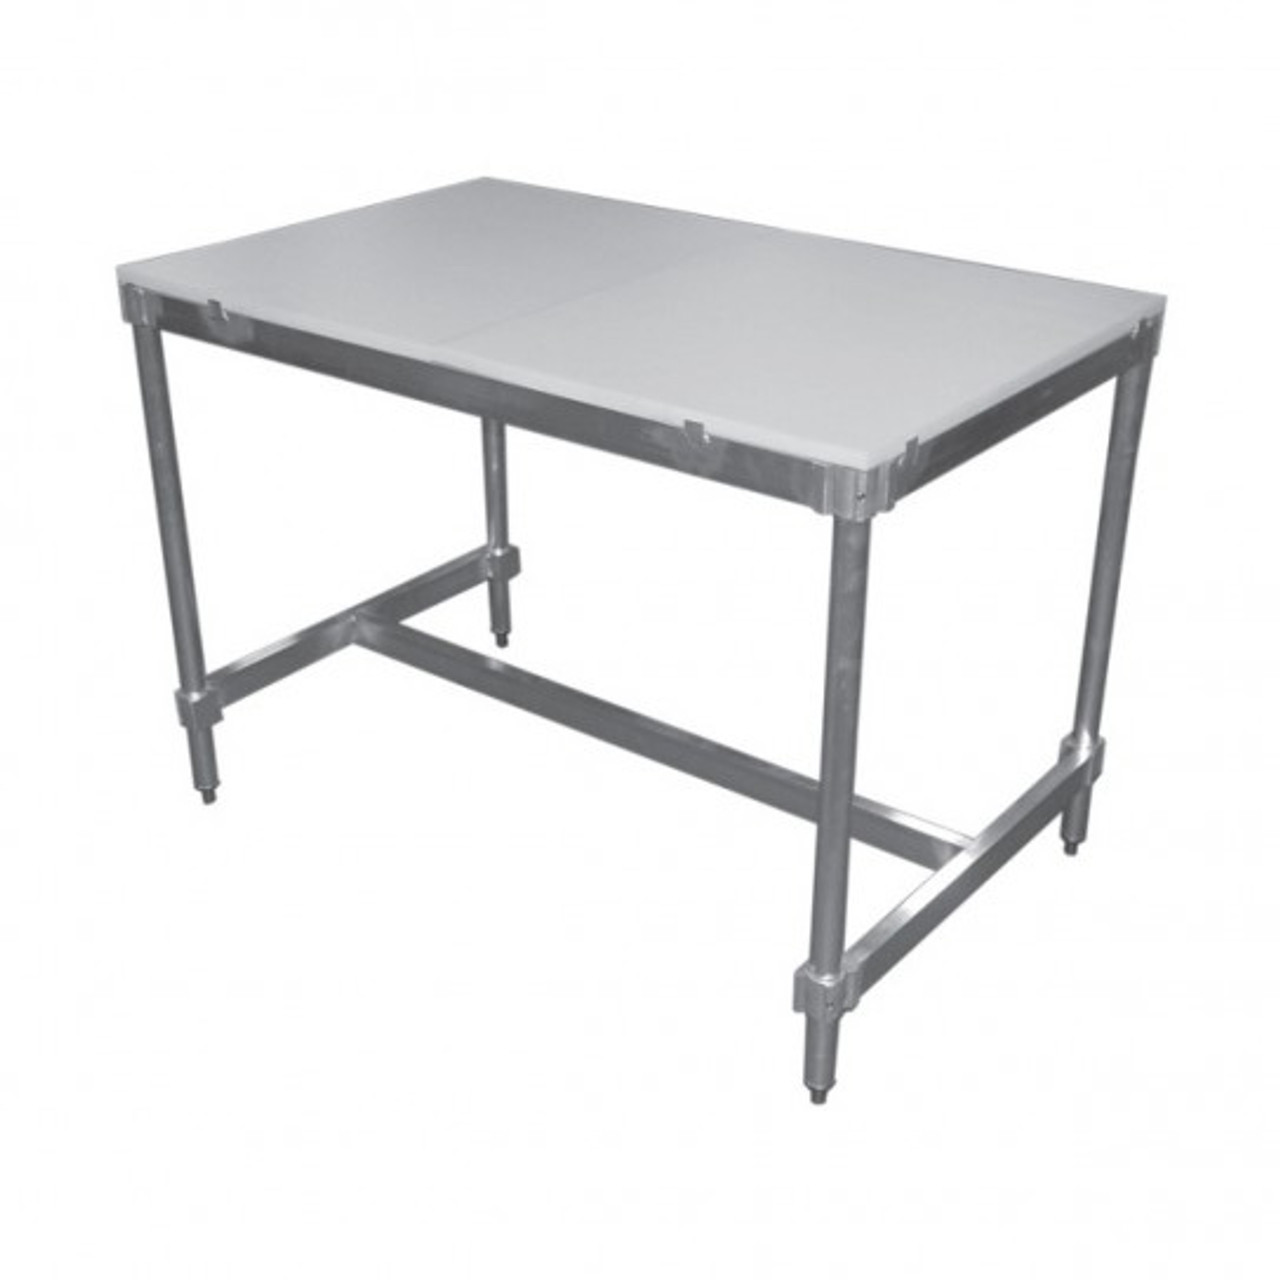 "Poly Top Tables without Backsplash Item Length 60"""